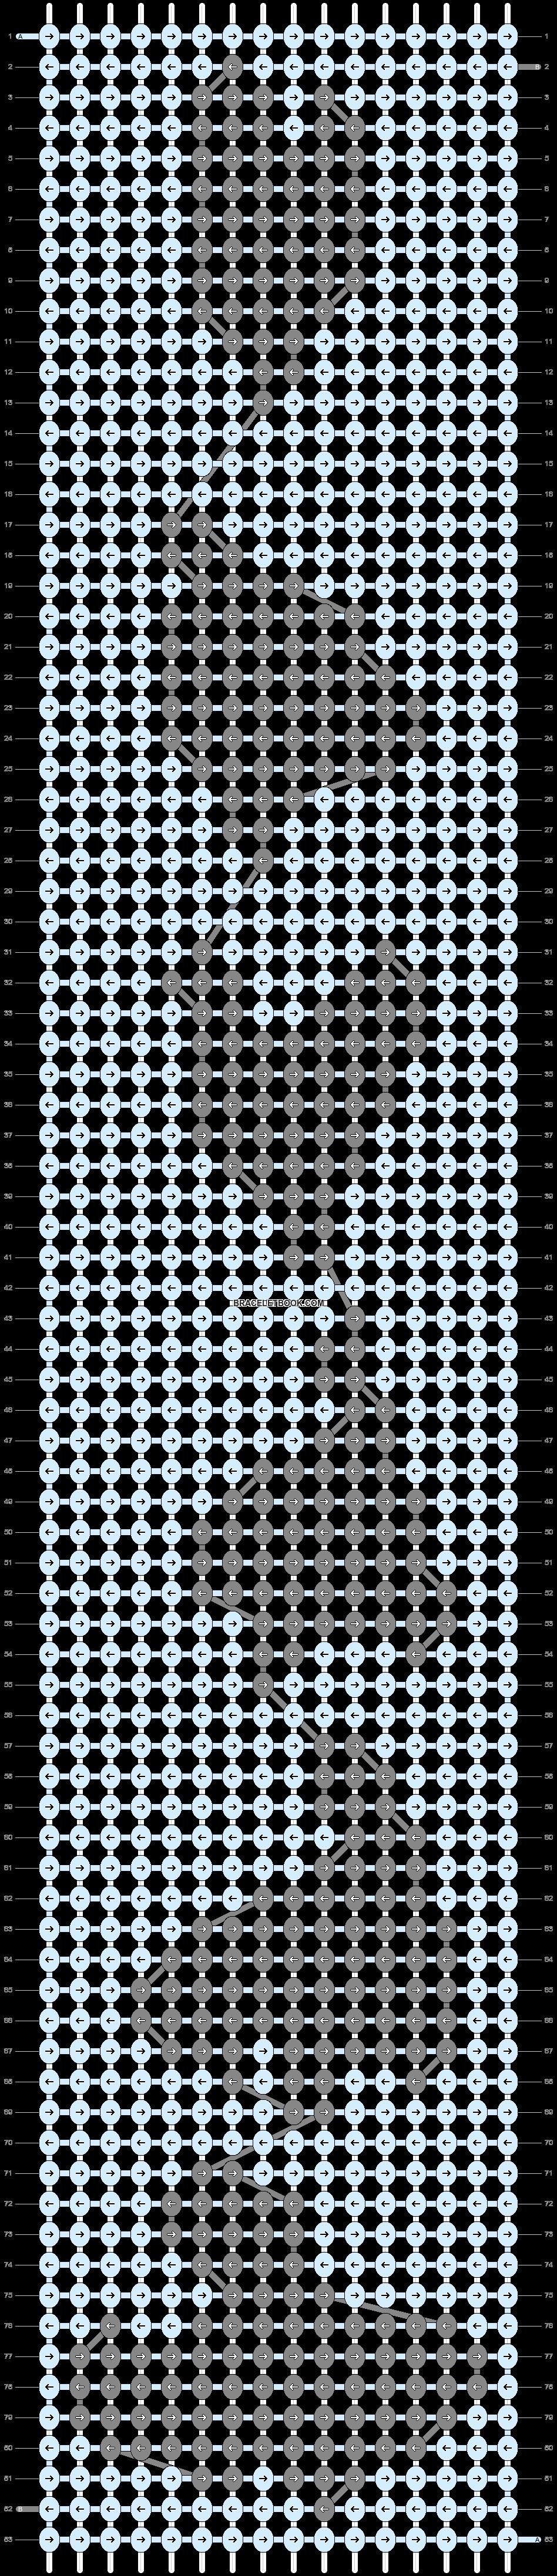 Alpha pattern #22183 pattern